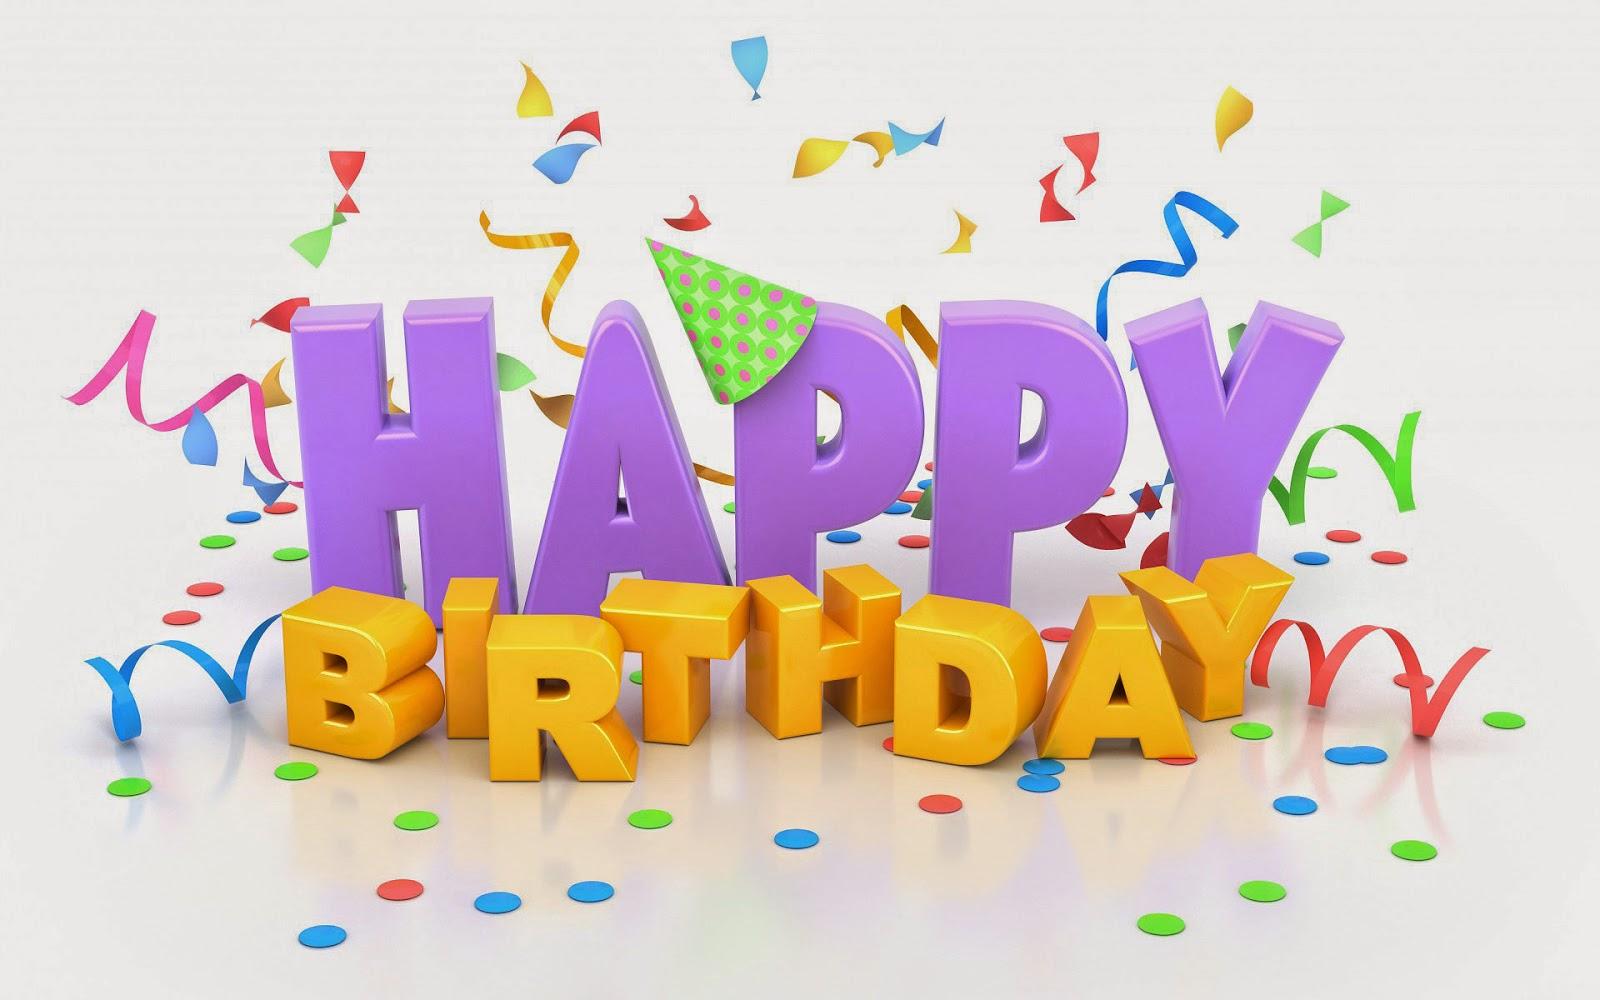 verjaardag achtergrond met 3D tekst happy birthday